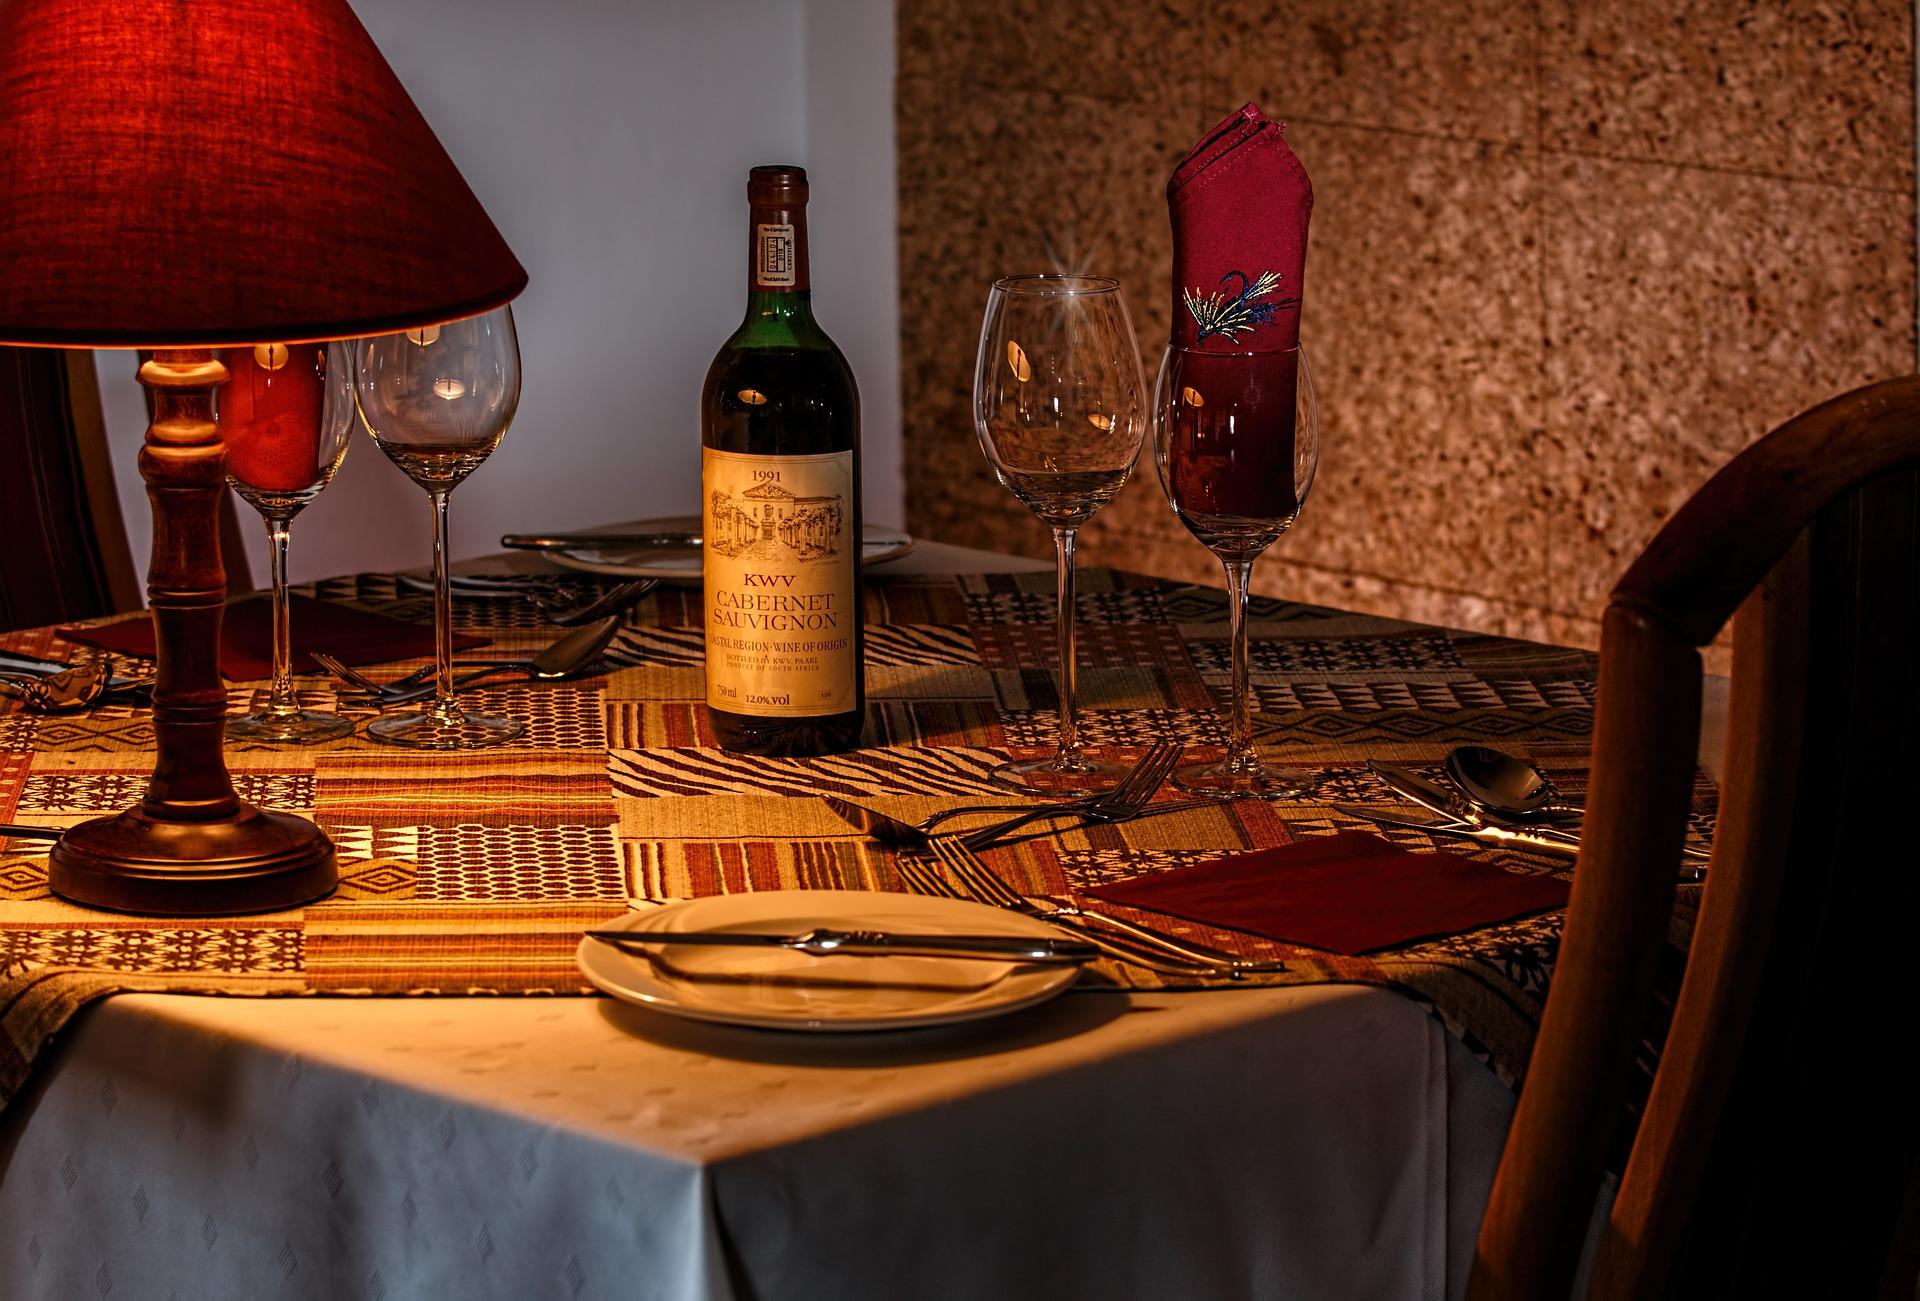 Cabernet Sauvignon and Sauvignon Blanc - Wine Pairings this Winter